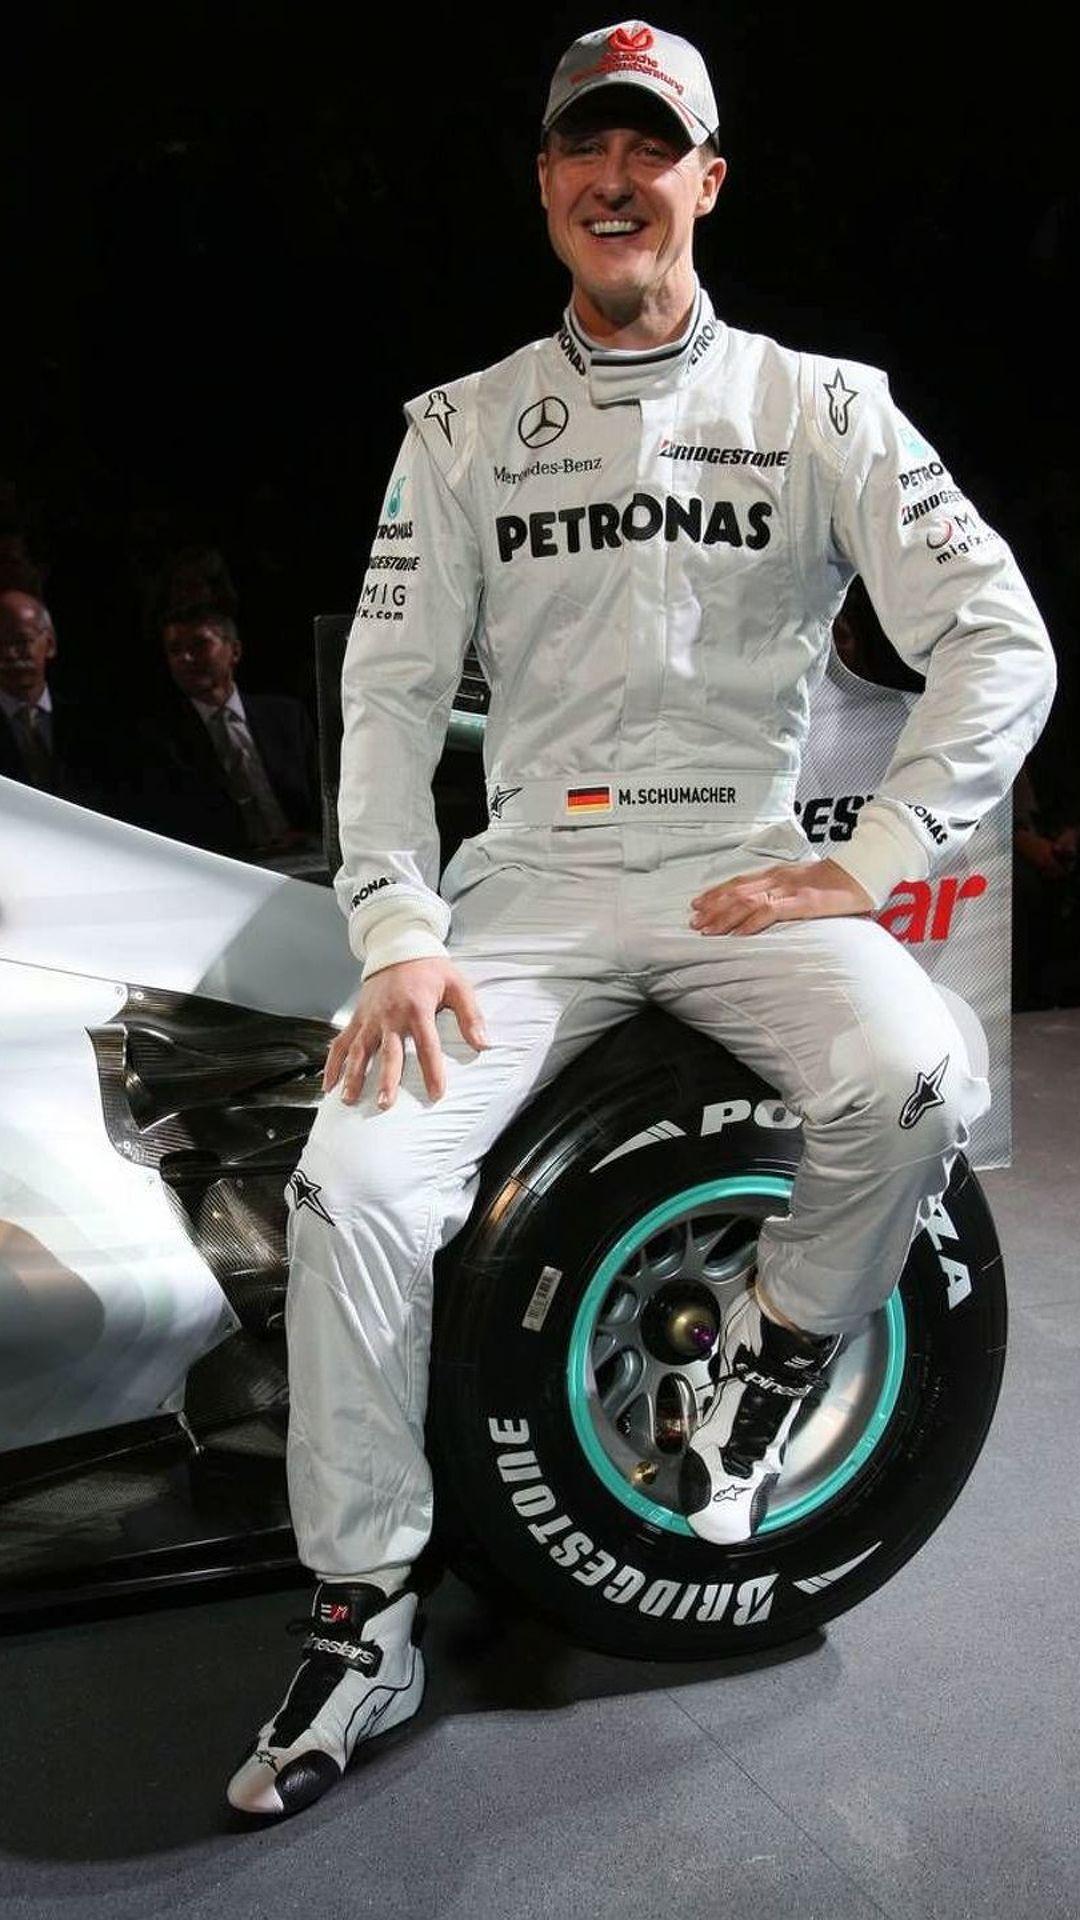 Schu insists Mercedes talks began after 2009 season